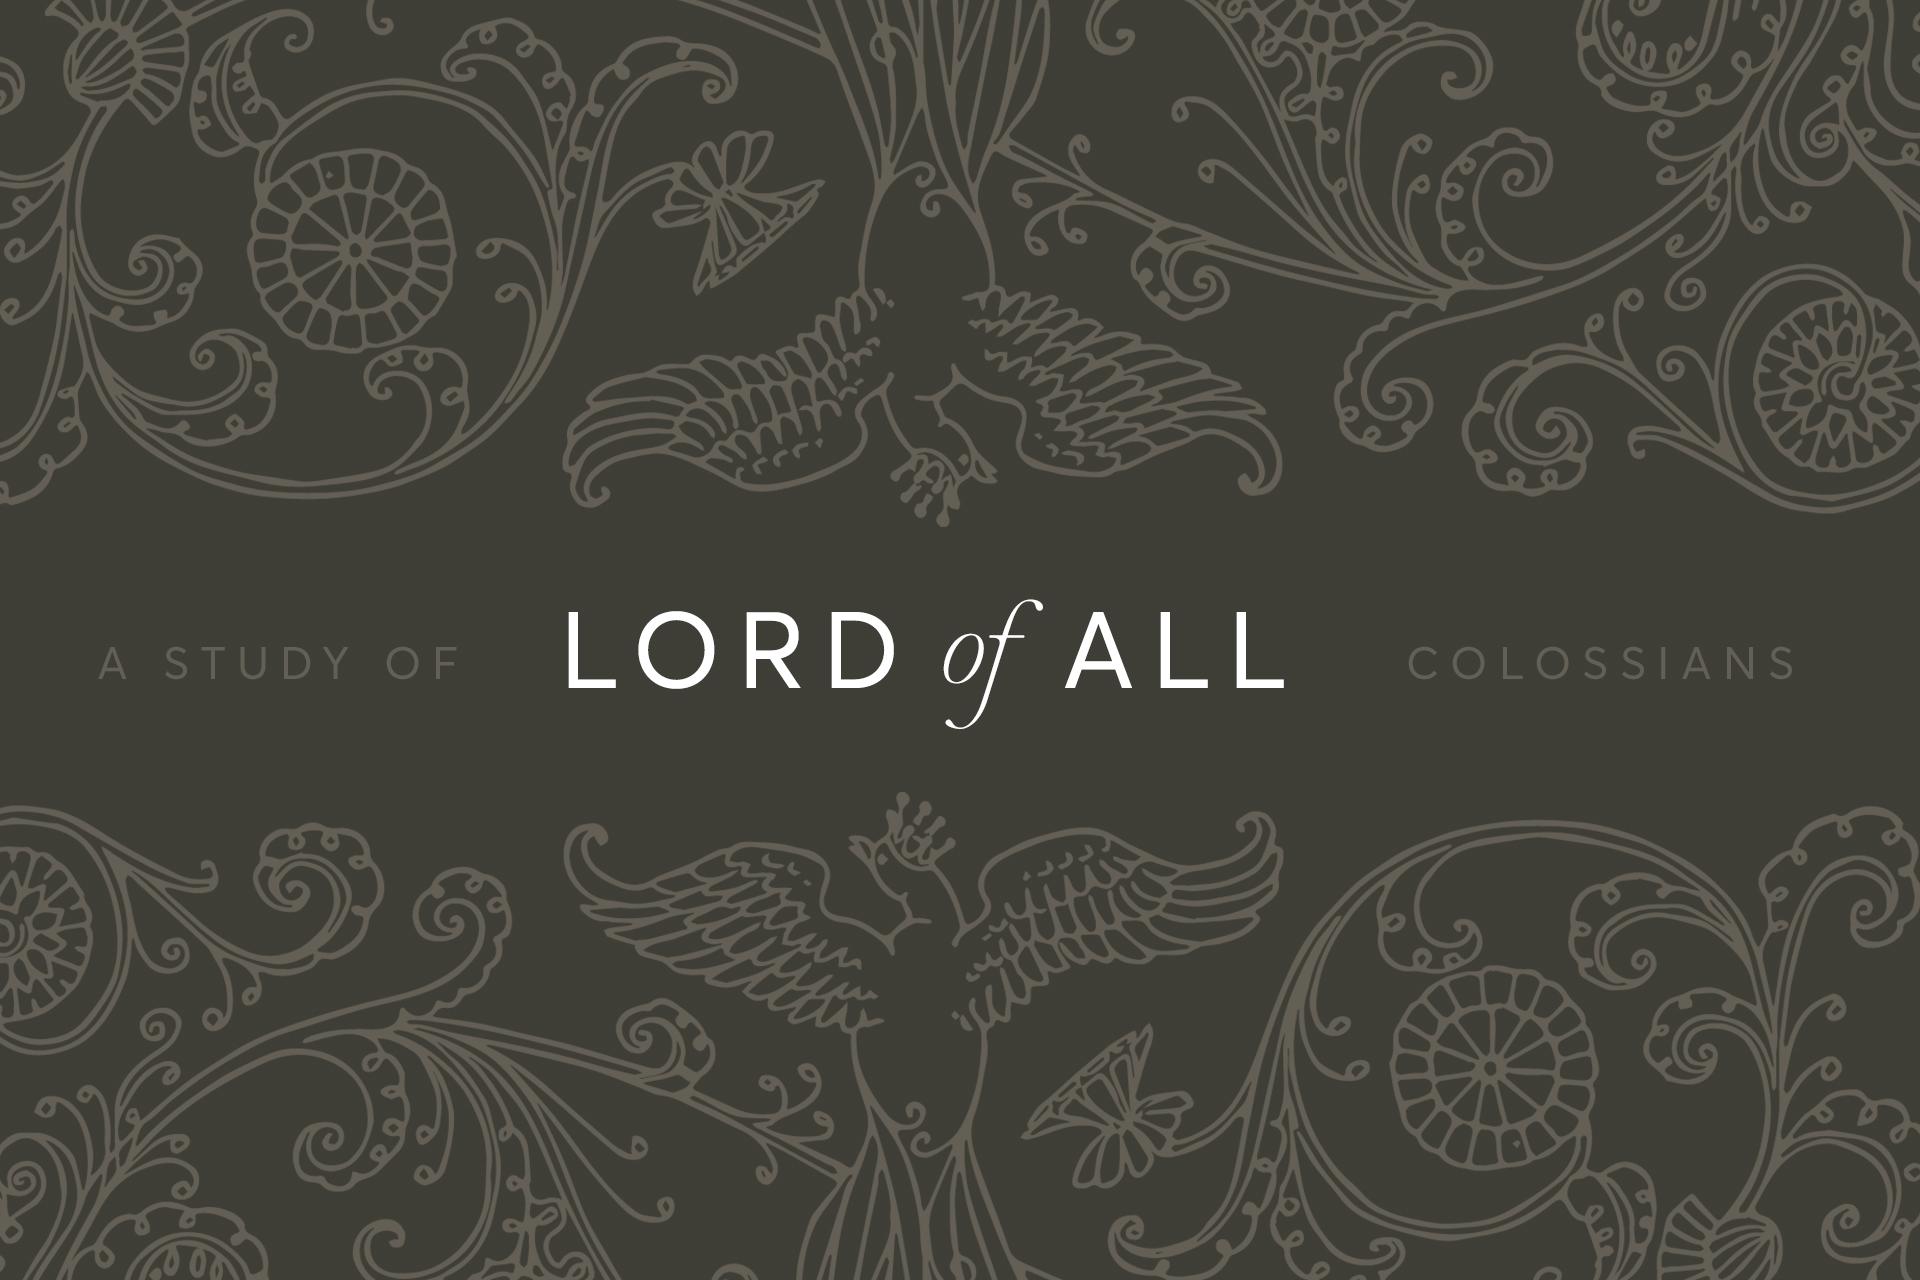 LordOfAll-title-edit.jpg